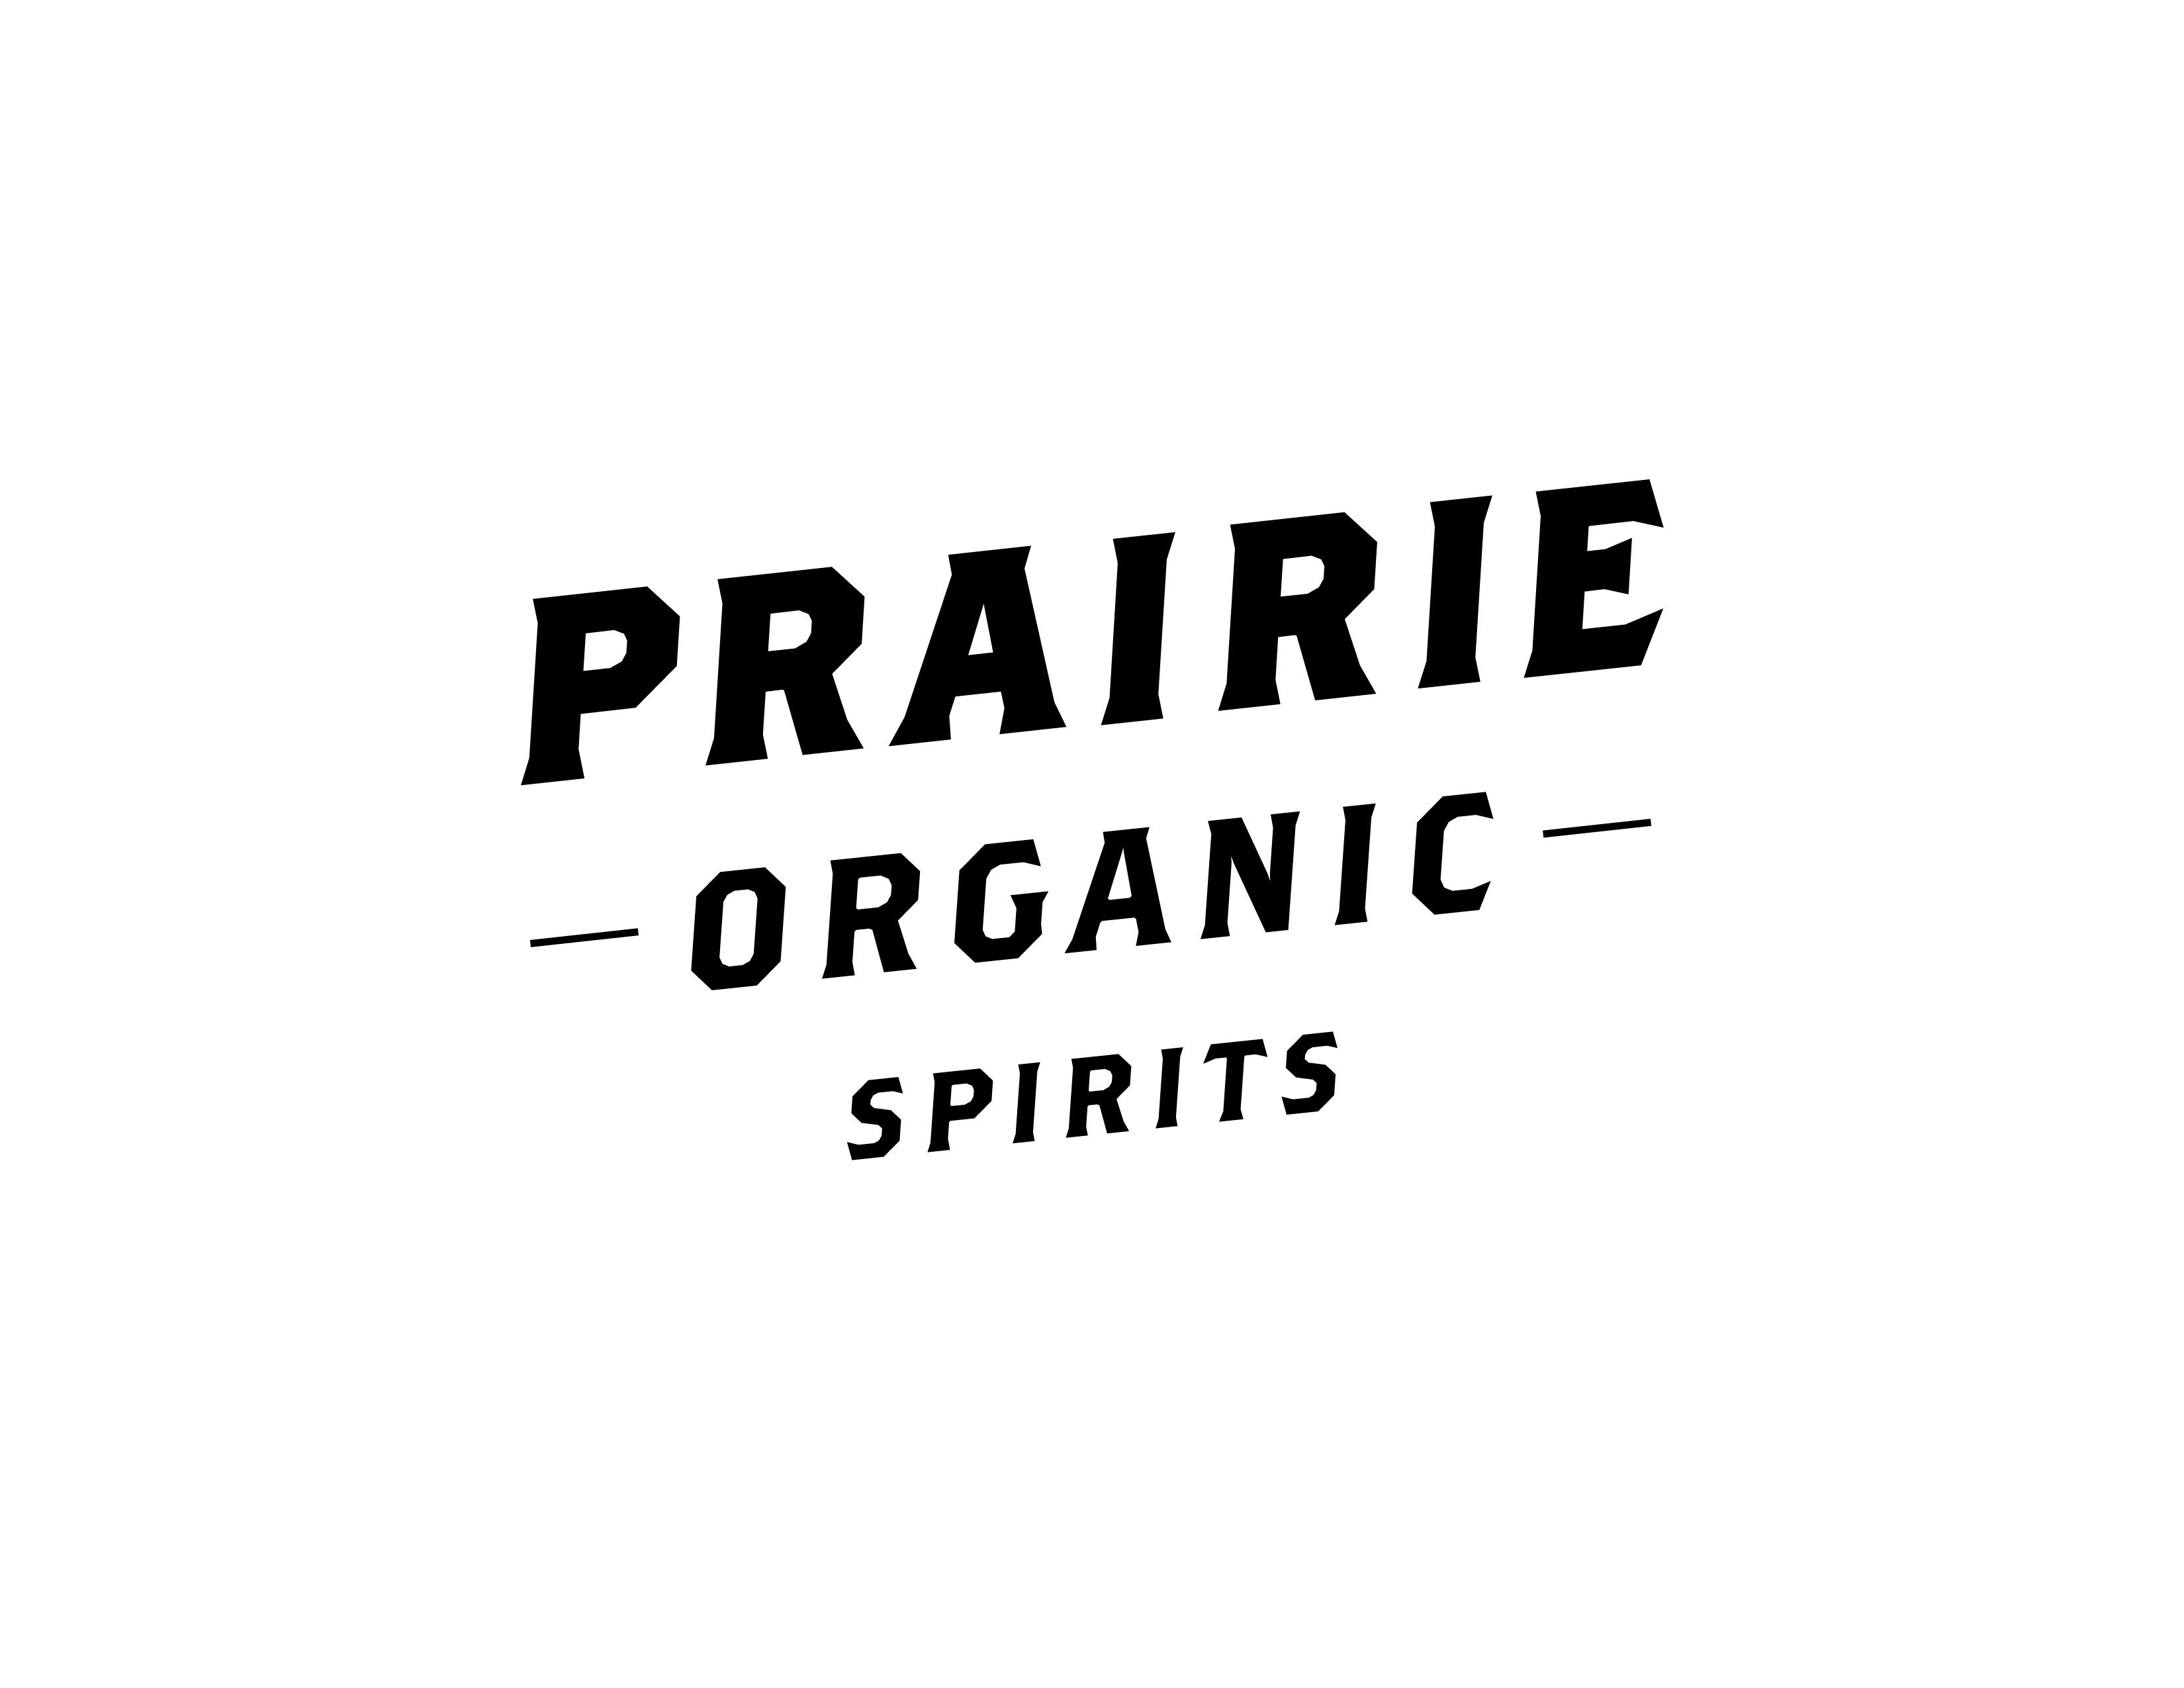 Prairie Organic Spirits logo